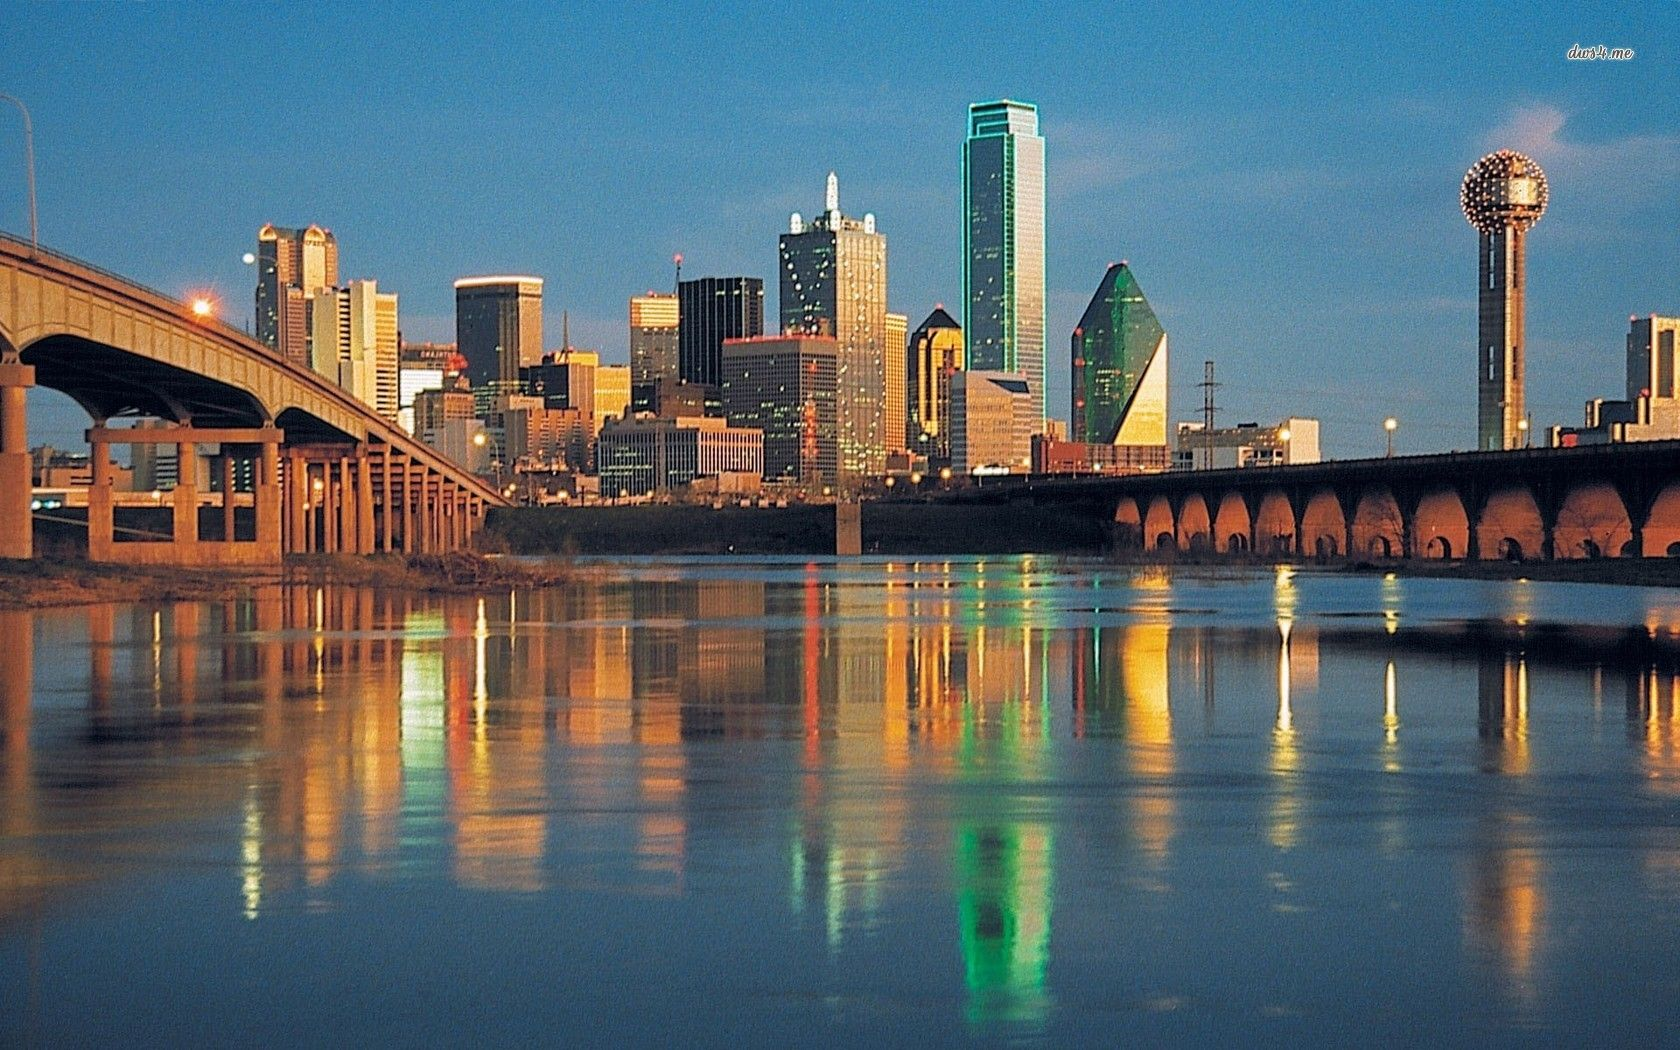 Dallas Skyline Wallpaper | Dallas skyline wallpaper ...